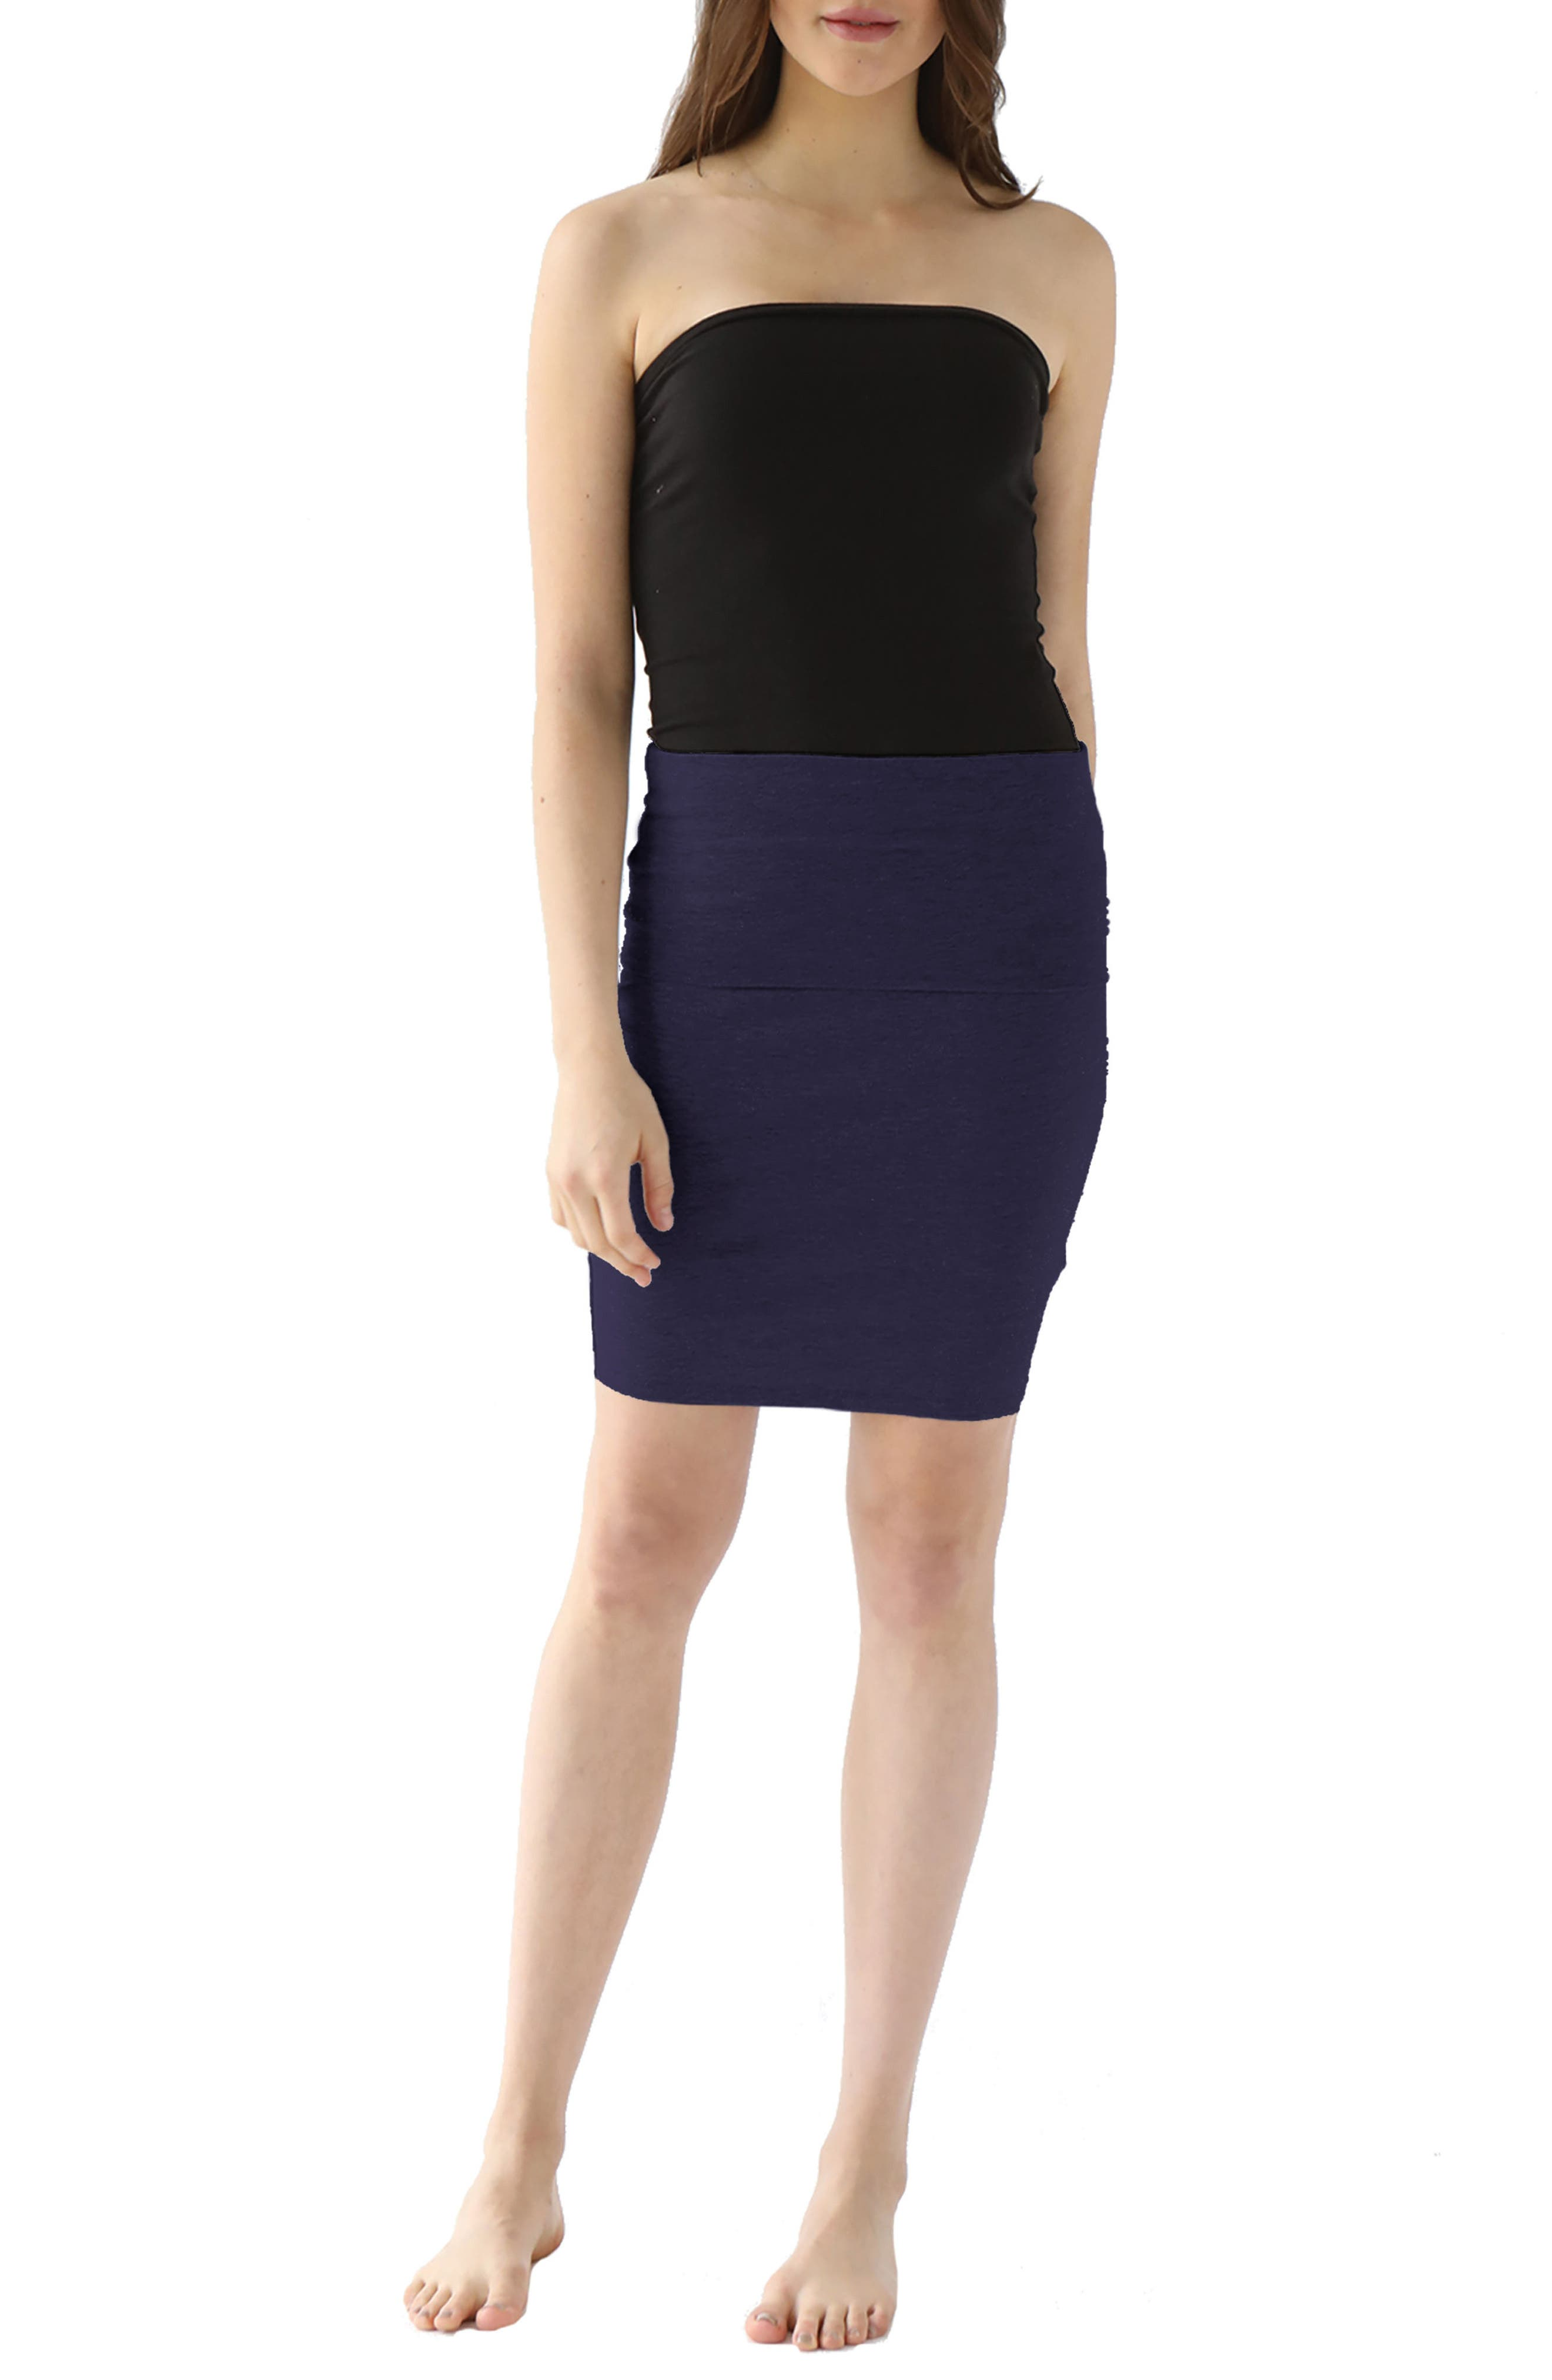 Trina Foldover Stretch Cotton Skirt,                             Main thumbnail 1, color,                             Midnight